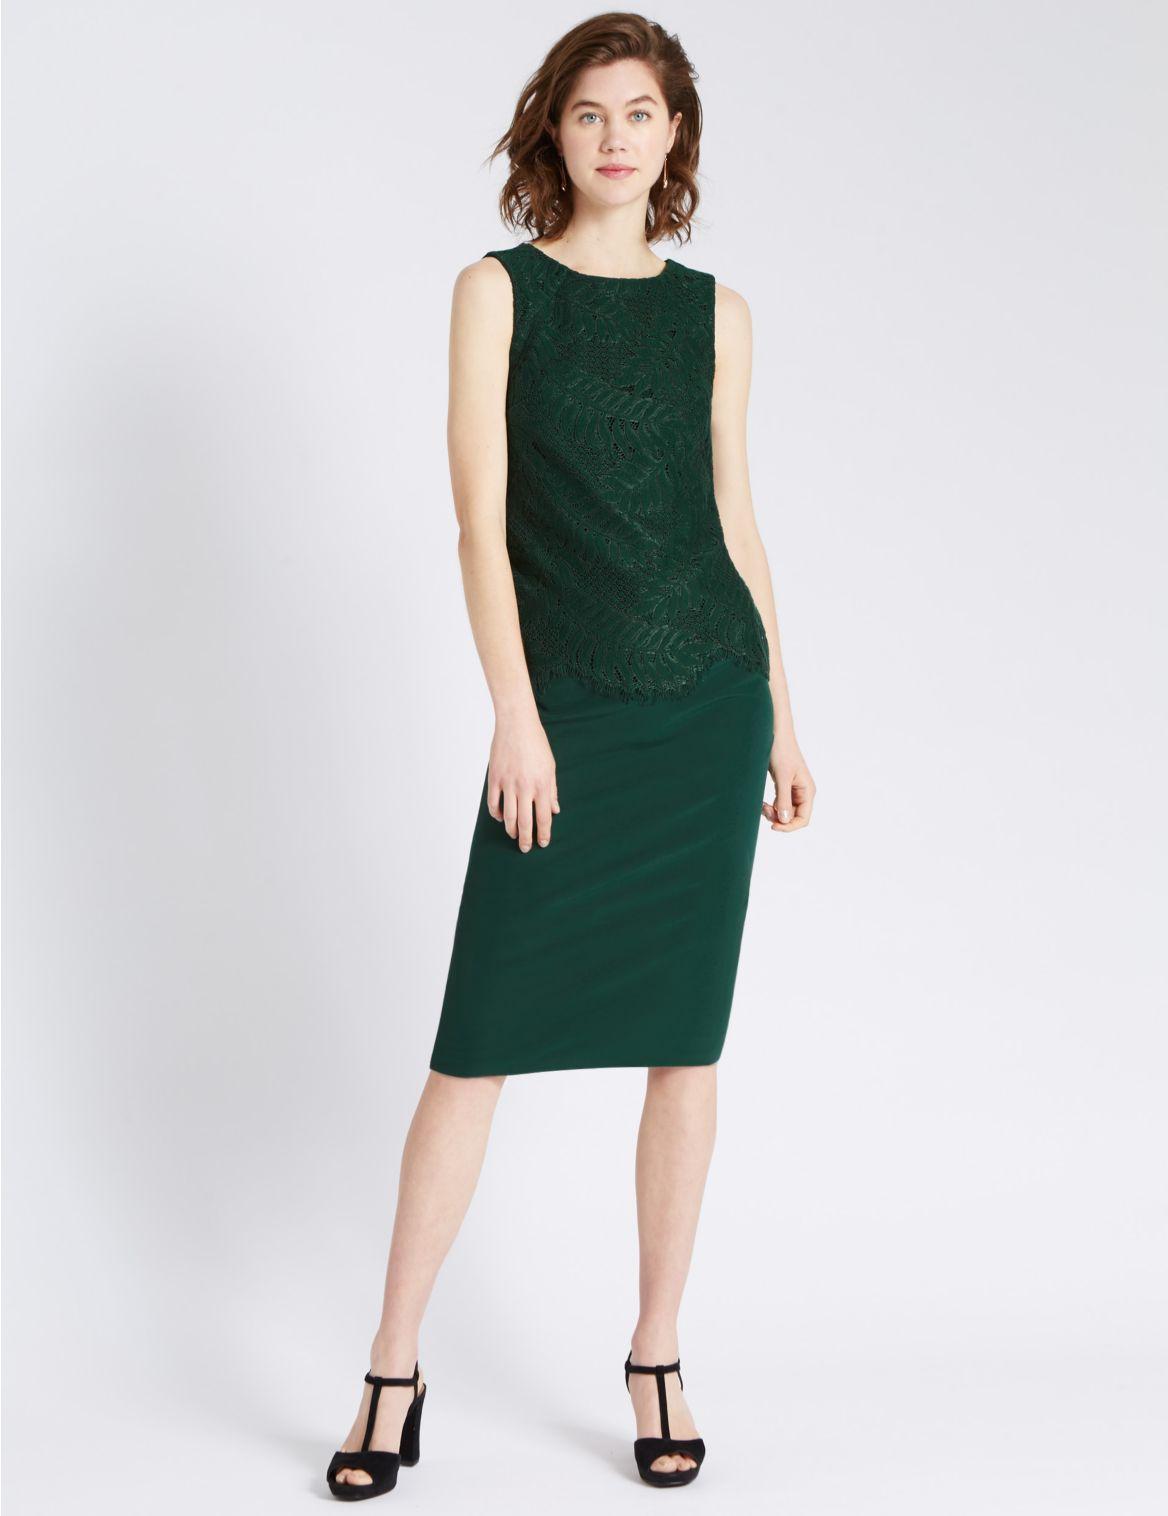 Dubbellaagse rechte jurk met kant